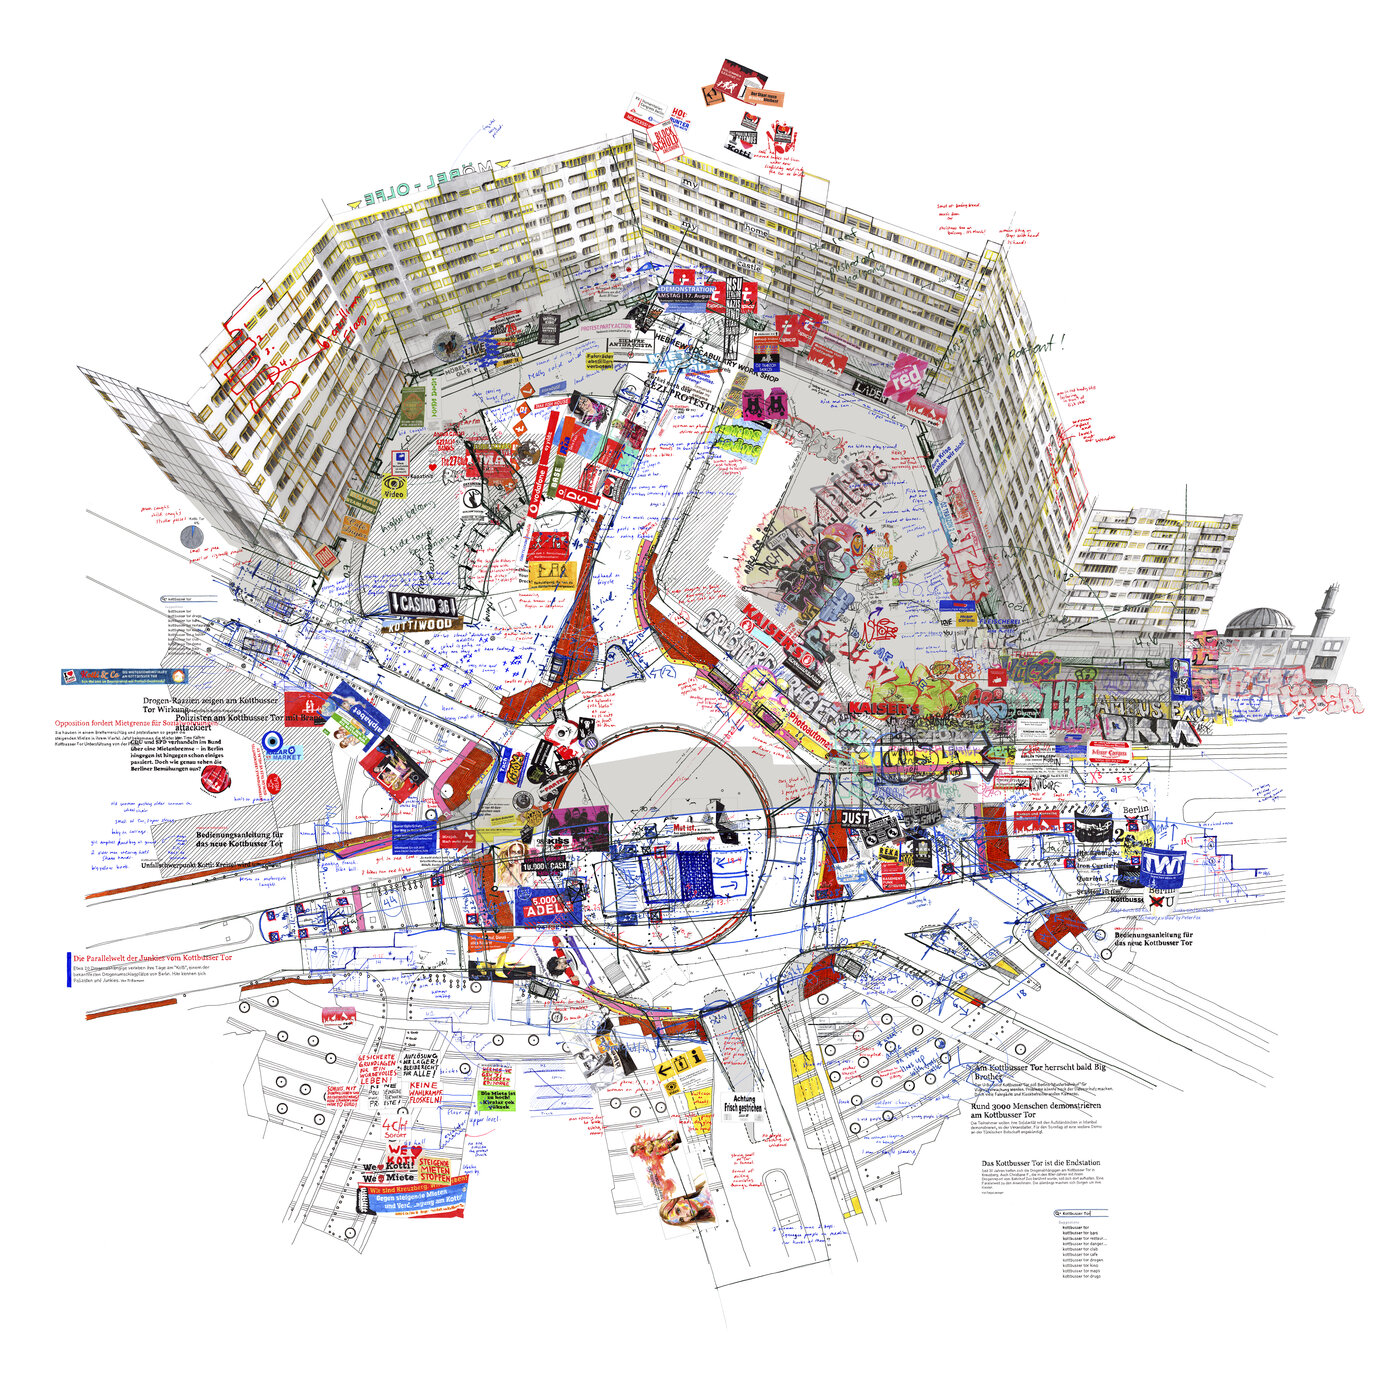 illustrated map of Kotbusser Damm by Larissa Fassler